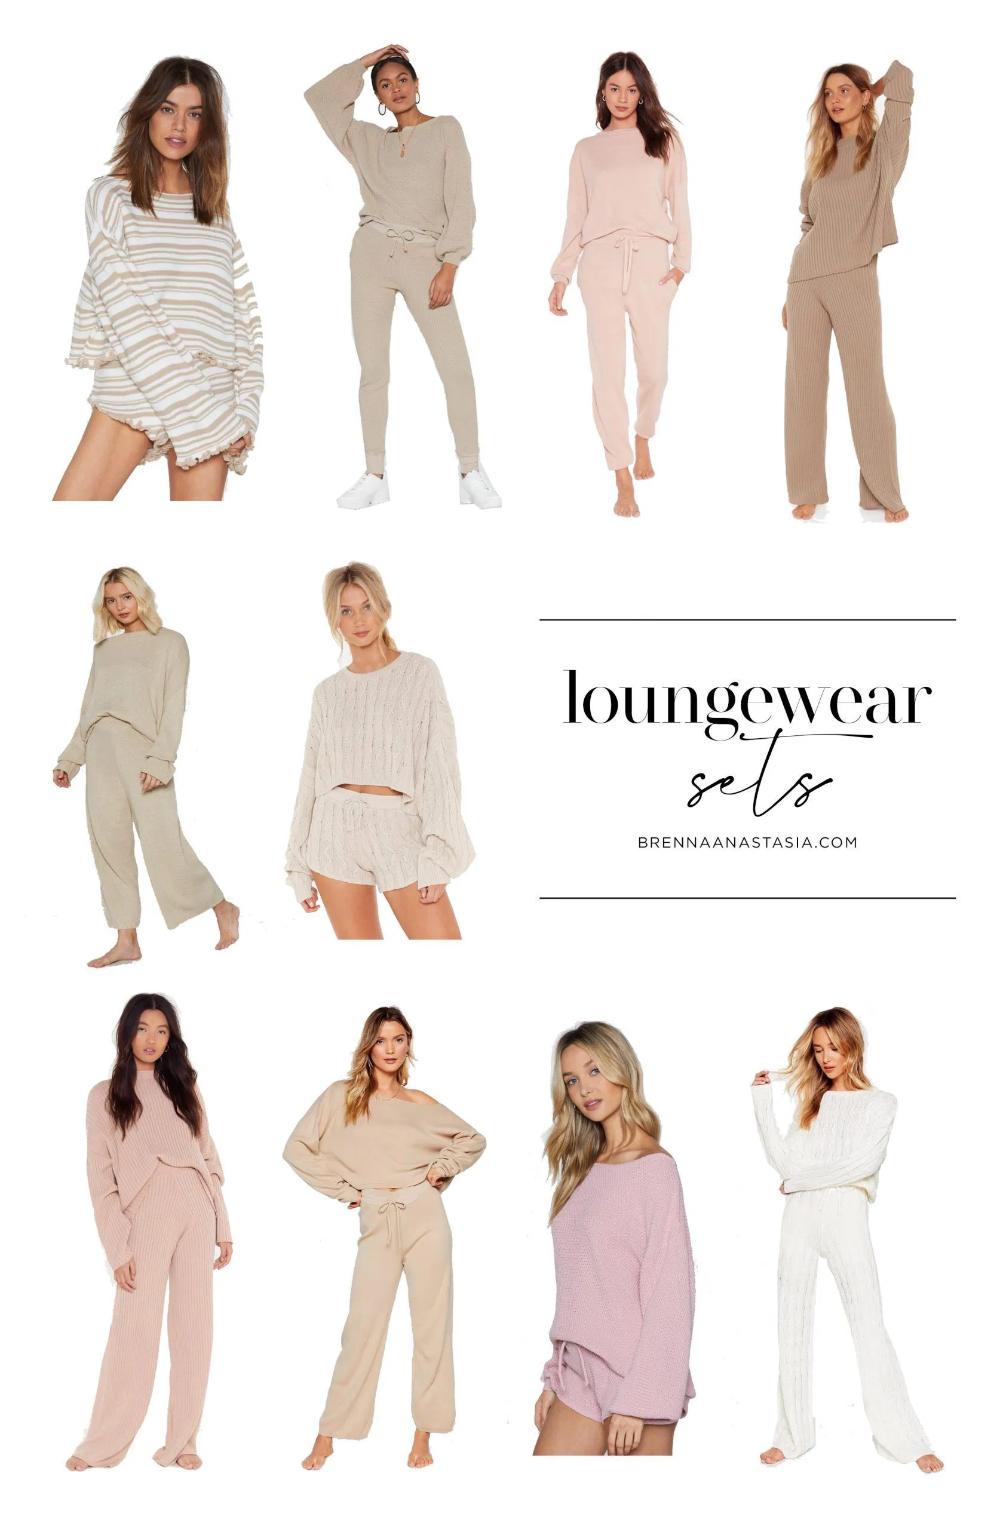 Loungewear Sets That Are Social Distancing Approved Brenna Anastasia Lounge Wear Loungewear Sets Loungewear Set [ 1529 x 1000 Pixel ]